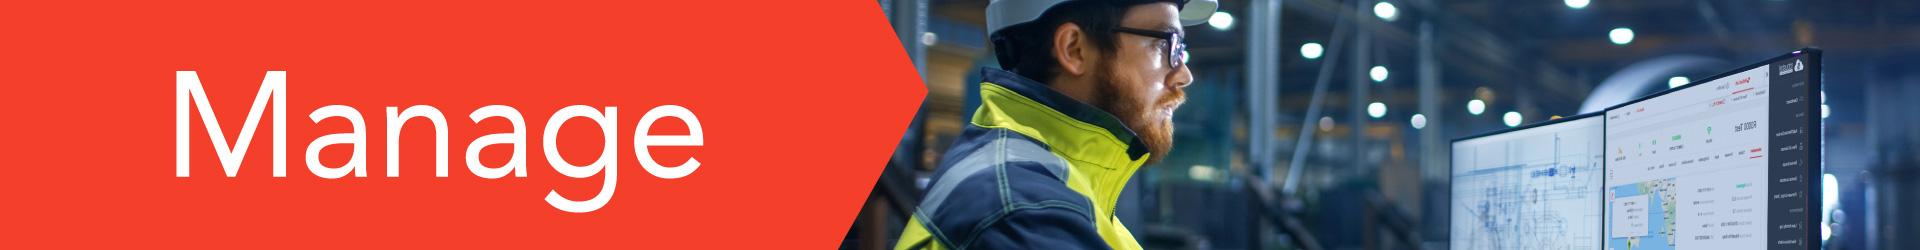 RCMS-Manage-Header